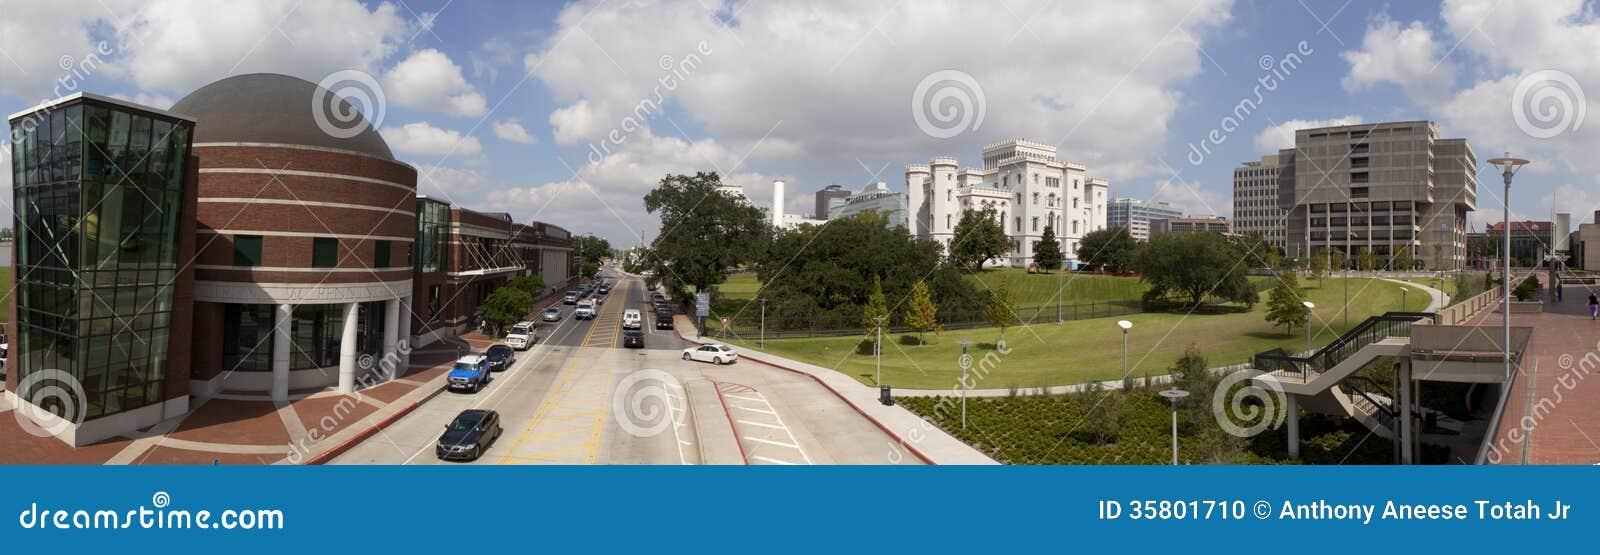 Panoramisch vom im Stadtzentrum gelegenen Baton Rouge, Louisiana